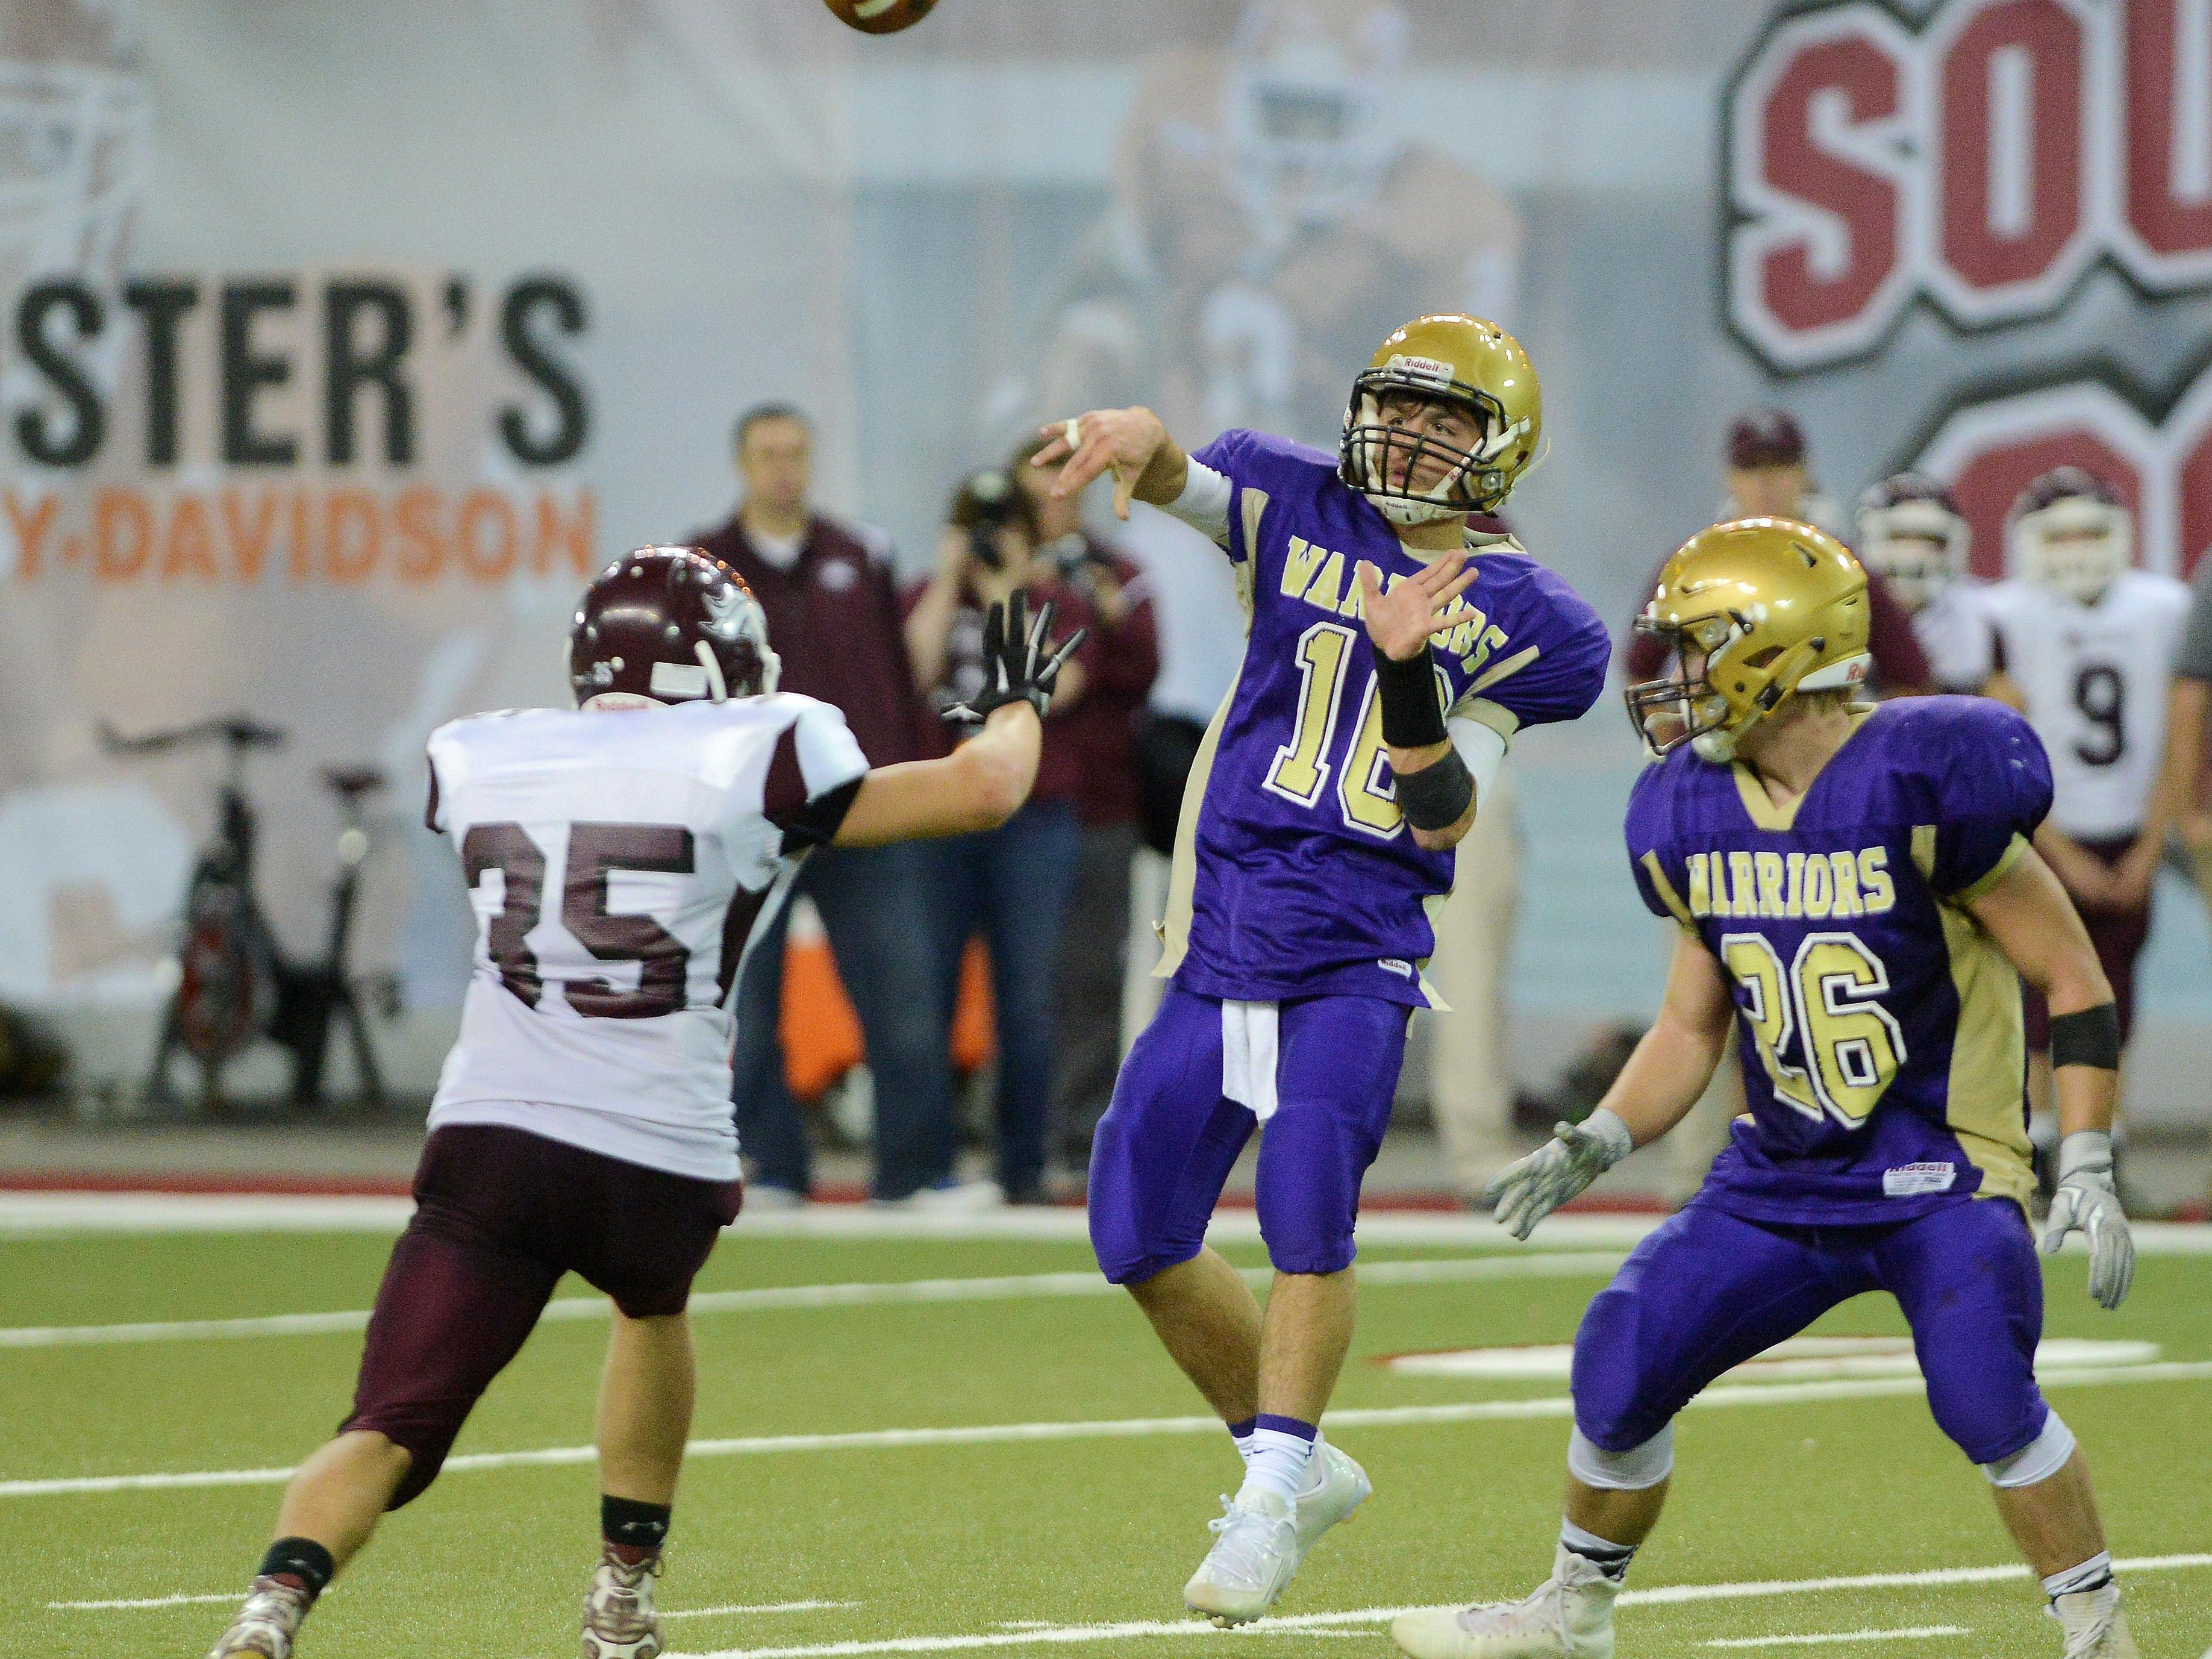 Winner quarterback, Drew DeMers throws a pass past Tri-Valley's Lane Hillman in Friday's class 11B football championship at the DakotaDome in Vermillion, Nov 13, 2015. Winner beat Tri-Valley 45-6.